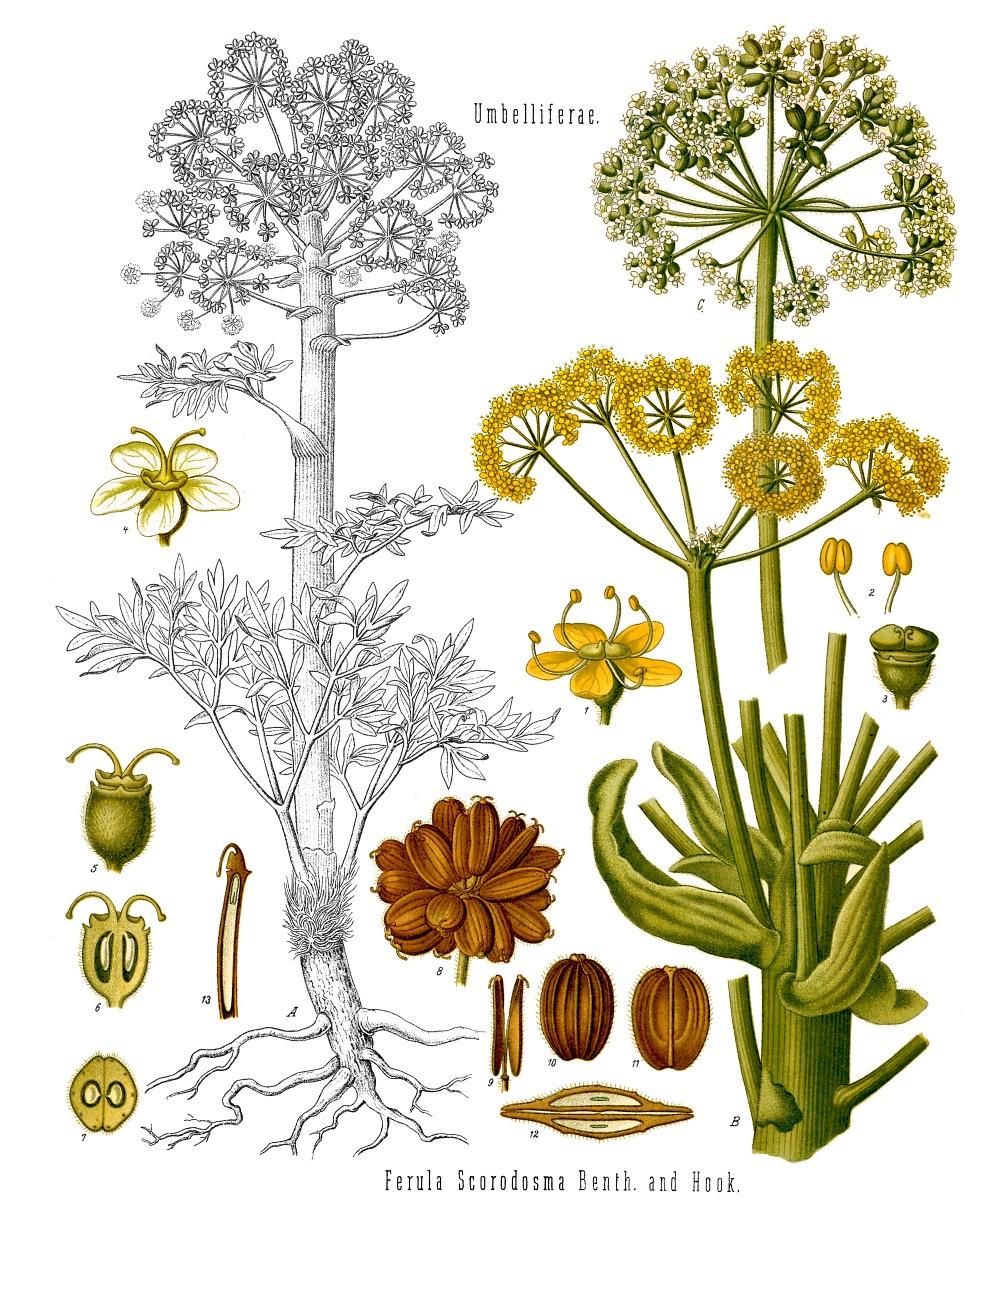 scientific drawing of a ferula species of plants